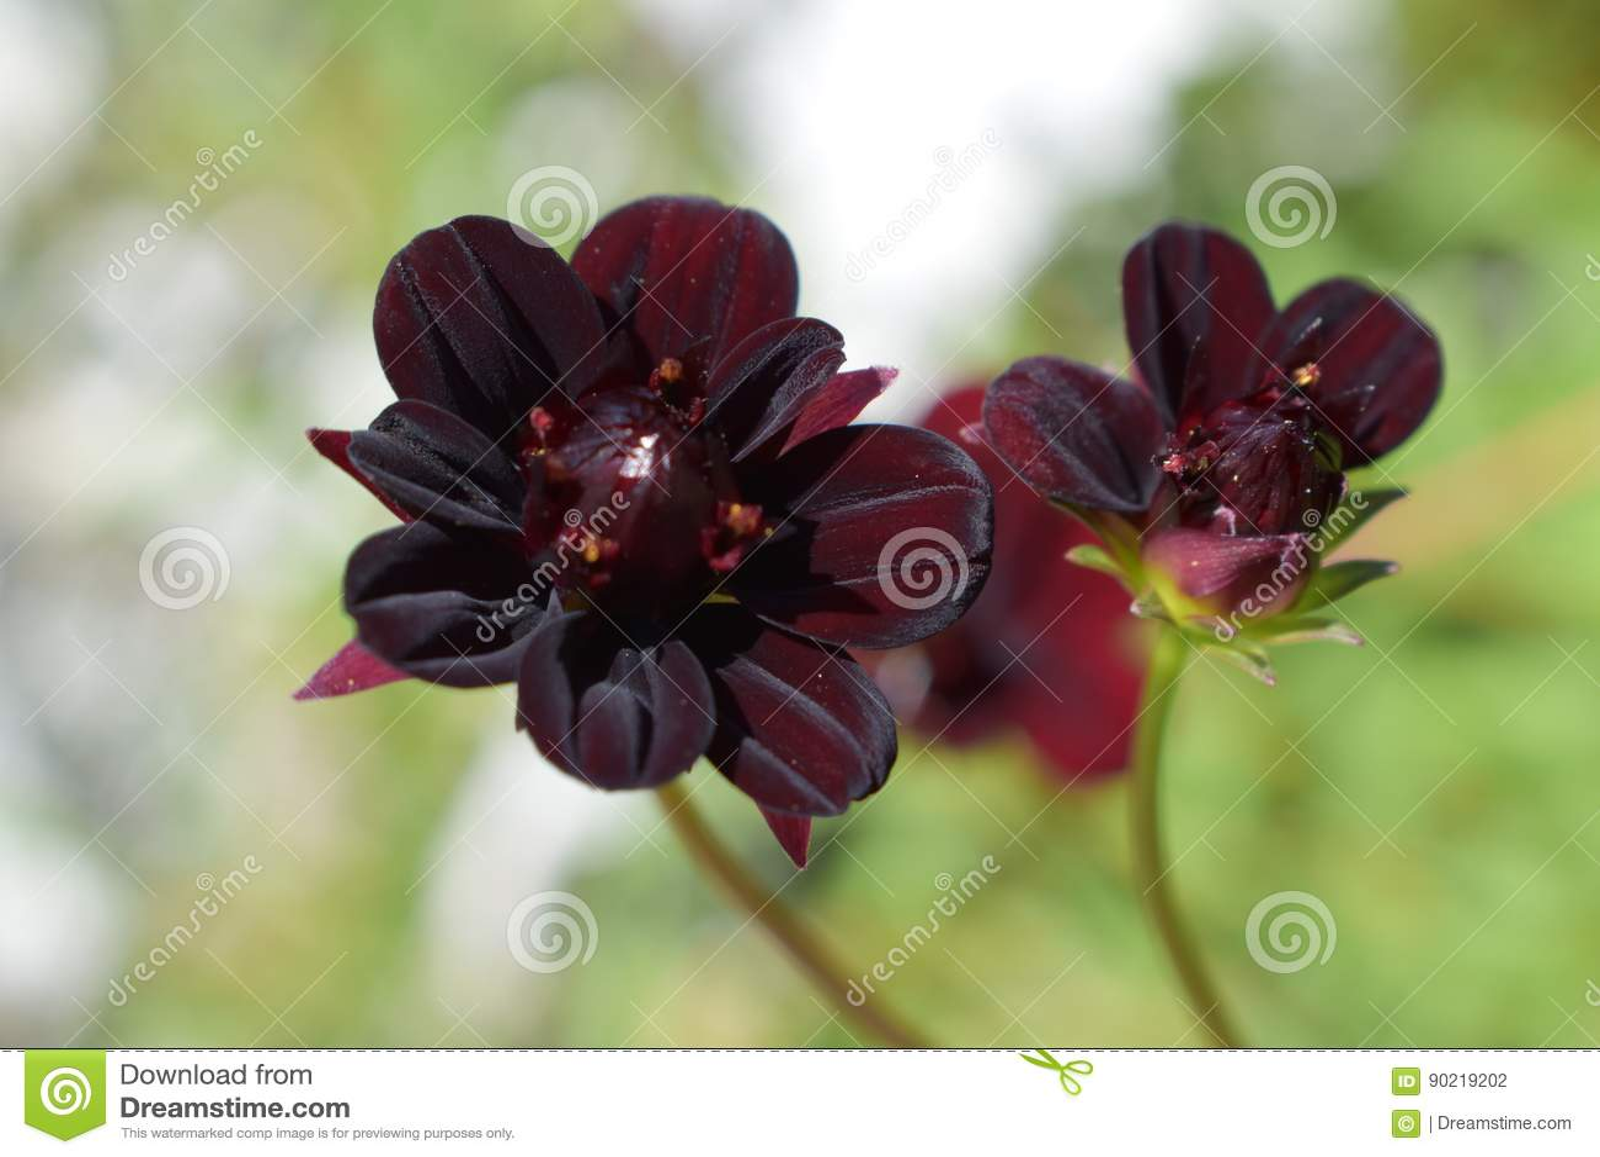 Small black dahlia flower stock photo image of bloom 90219202 download comp izmirmasajfo